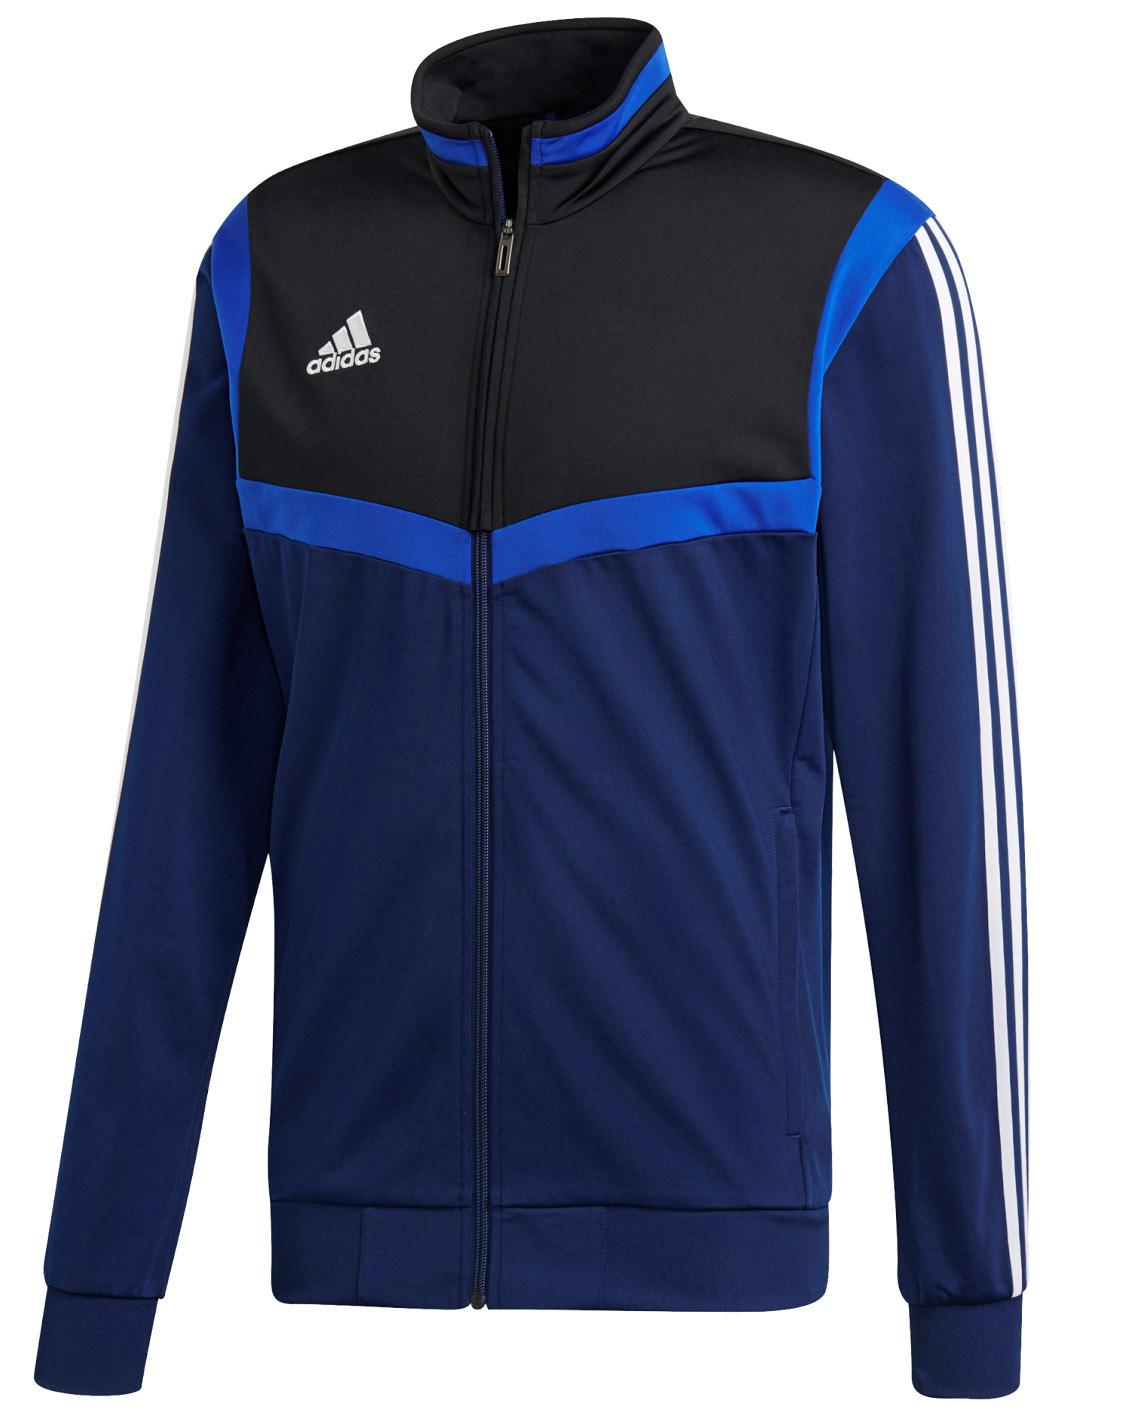 MN Sport Bluza Adidas TIRO 19 POLYESTER JACKET Junior DT5790